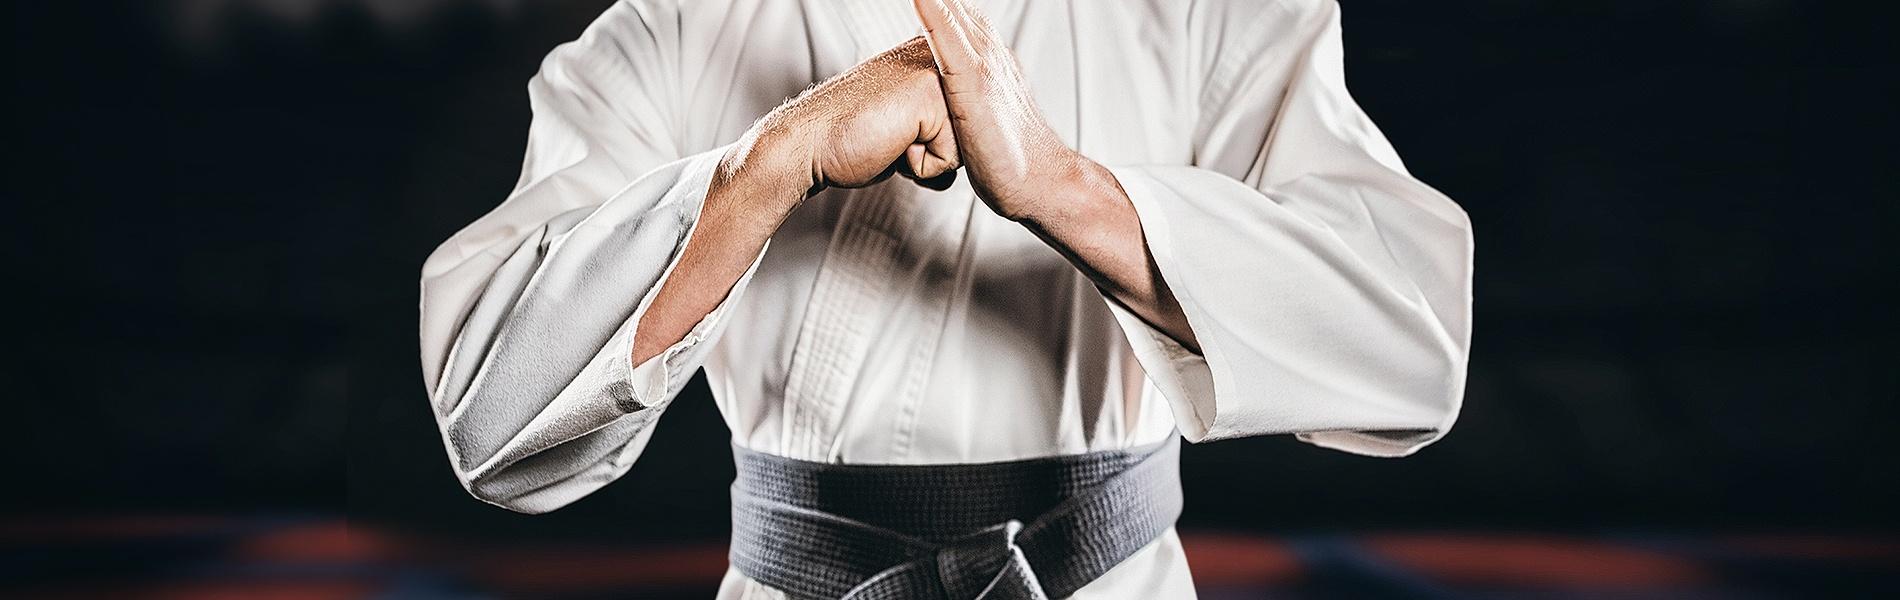 5-affordable-martial-arts-marketing-ideas